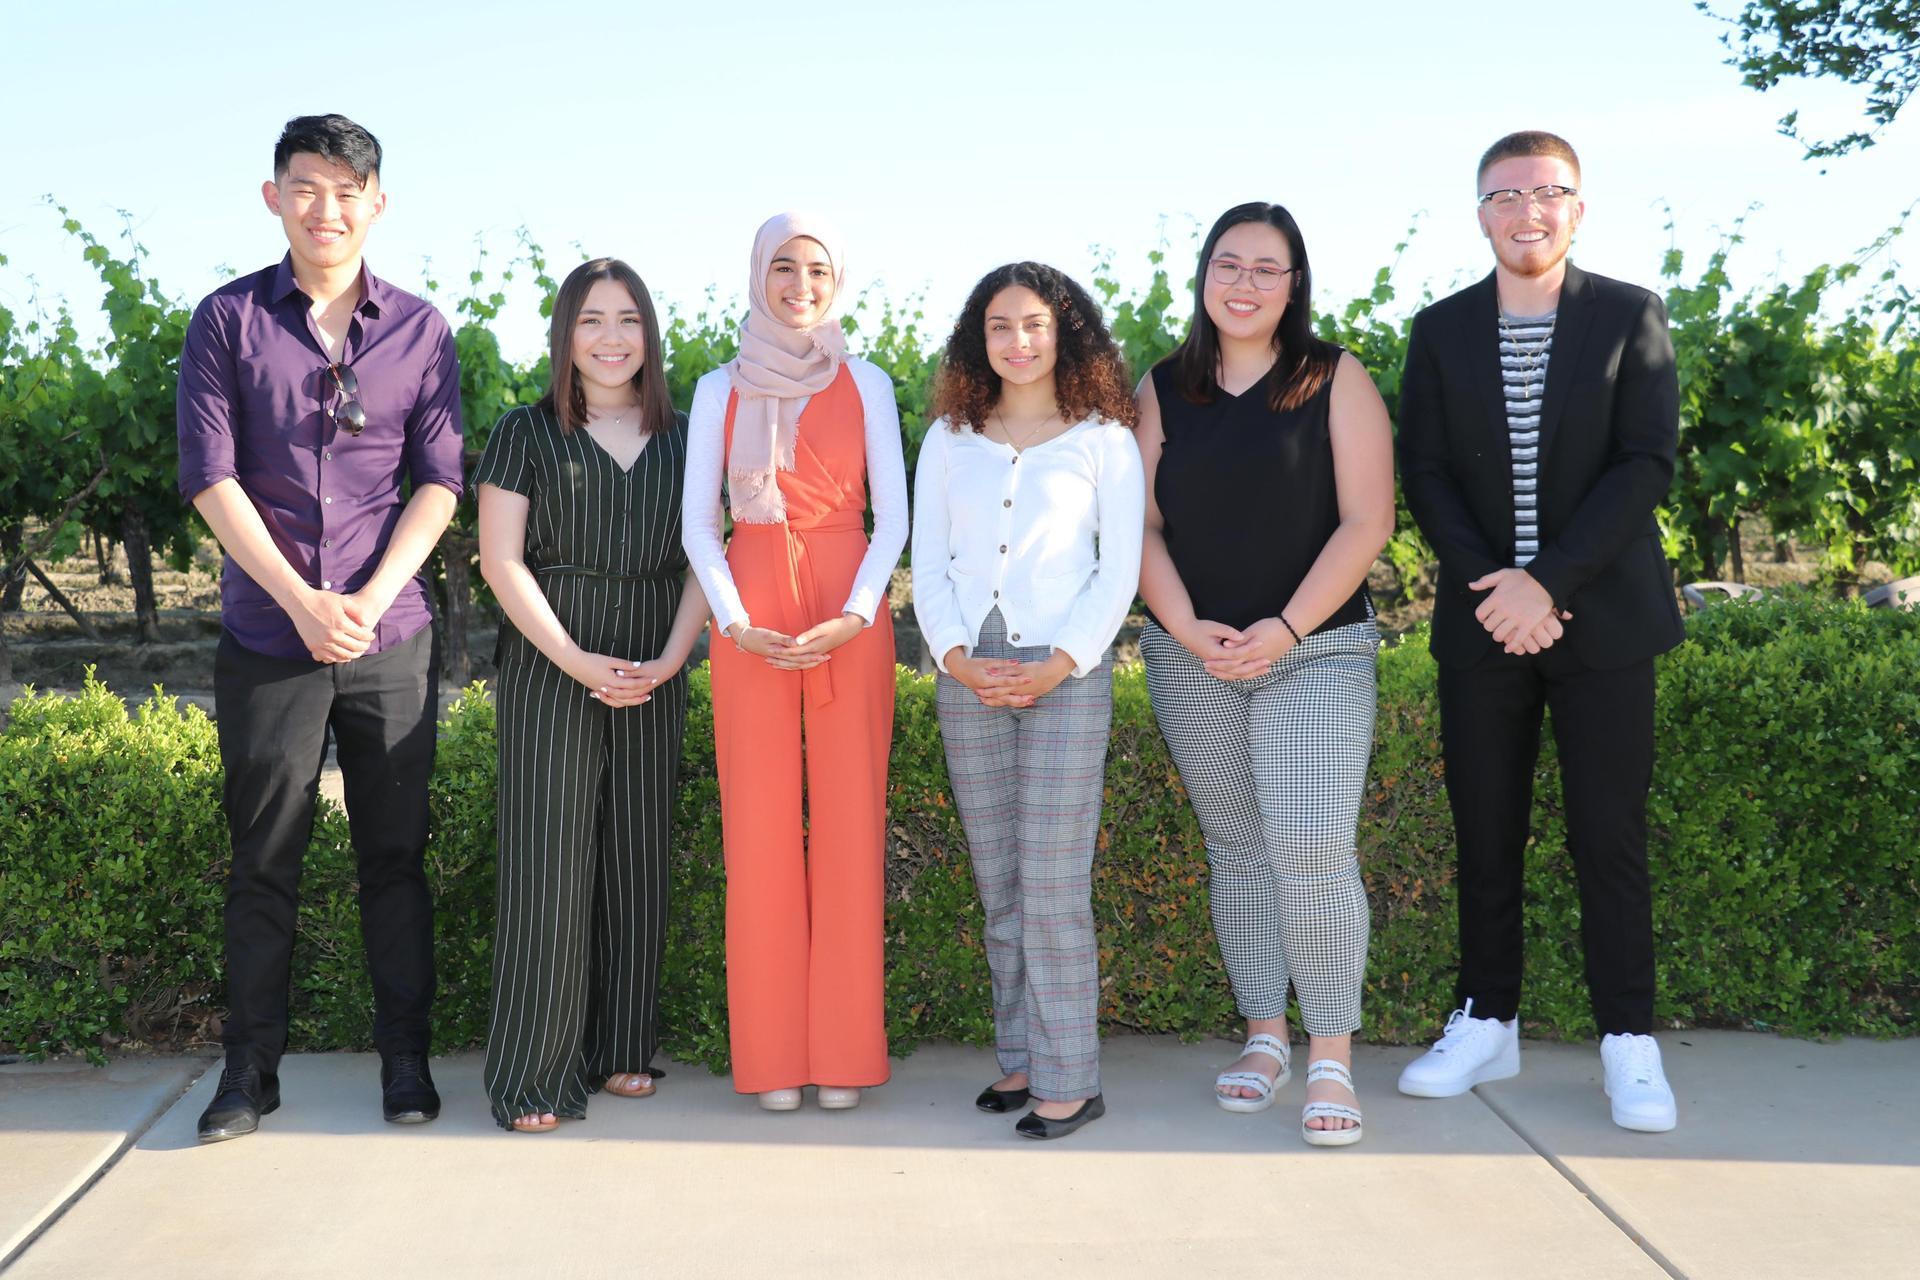 2019 Janessa Ramirez Scholarship Award Recipients